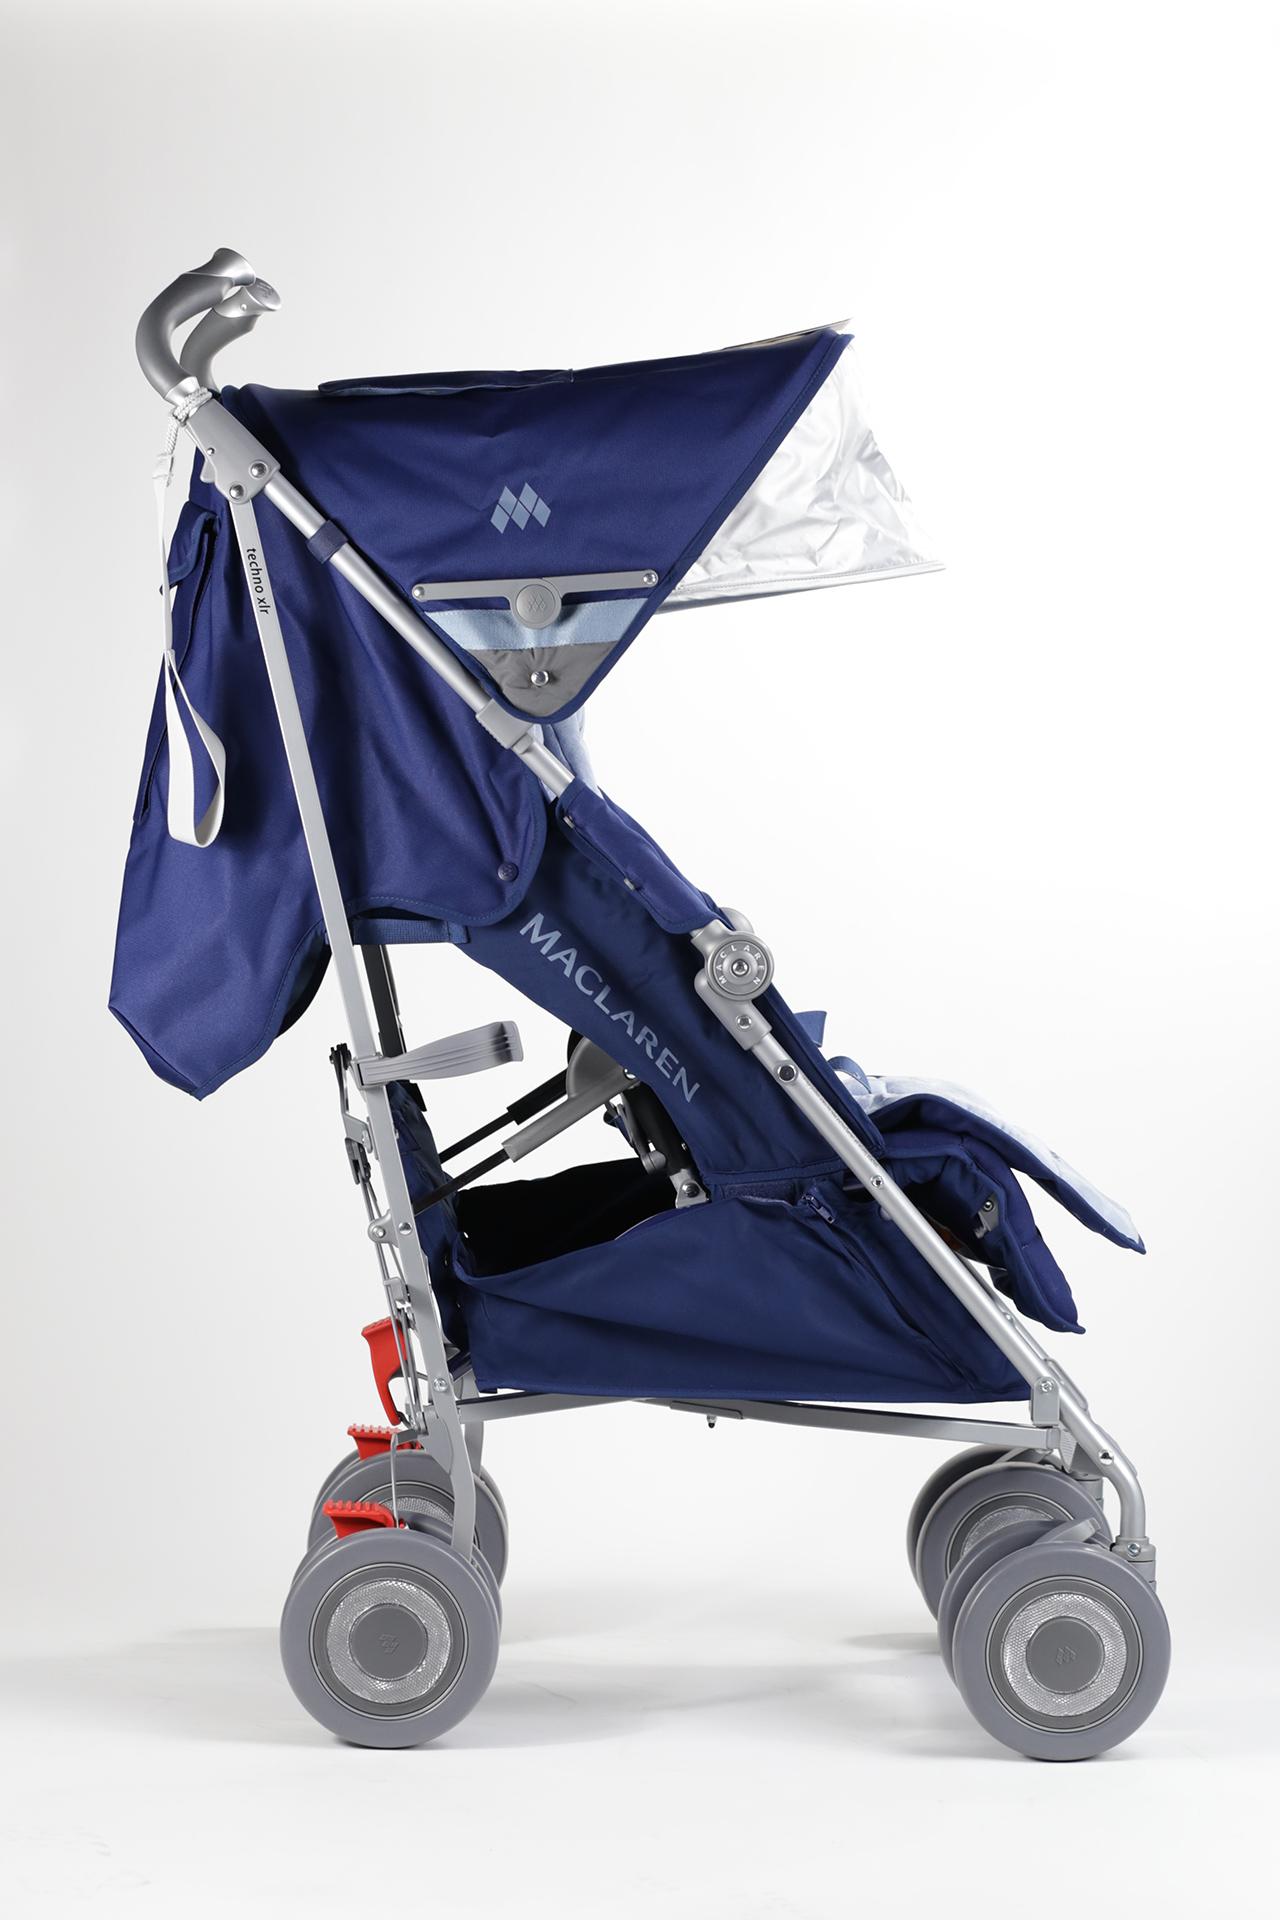 Silla de paseo TECHNO XLR MacLaren 2015 Soft Blue